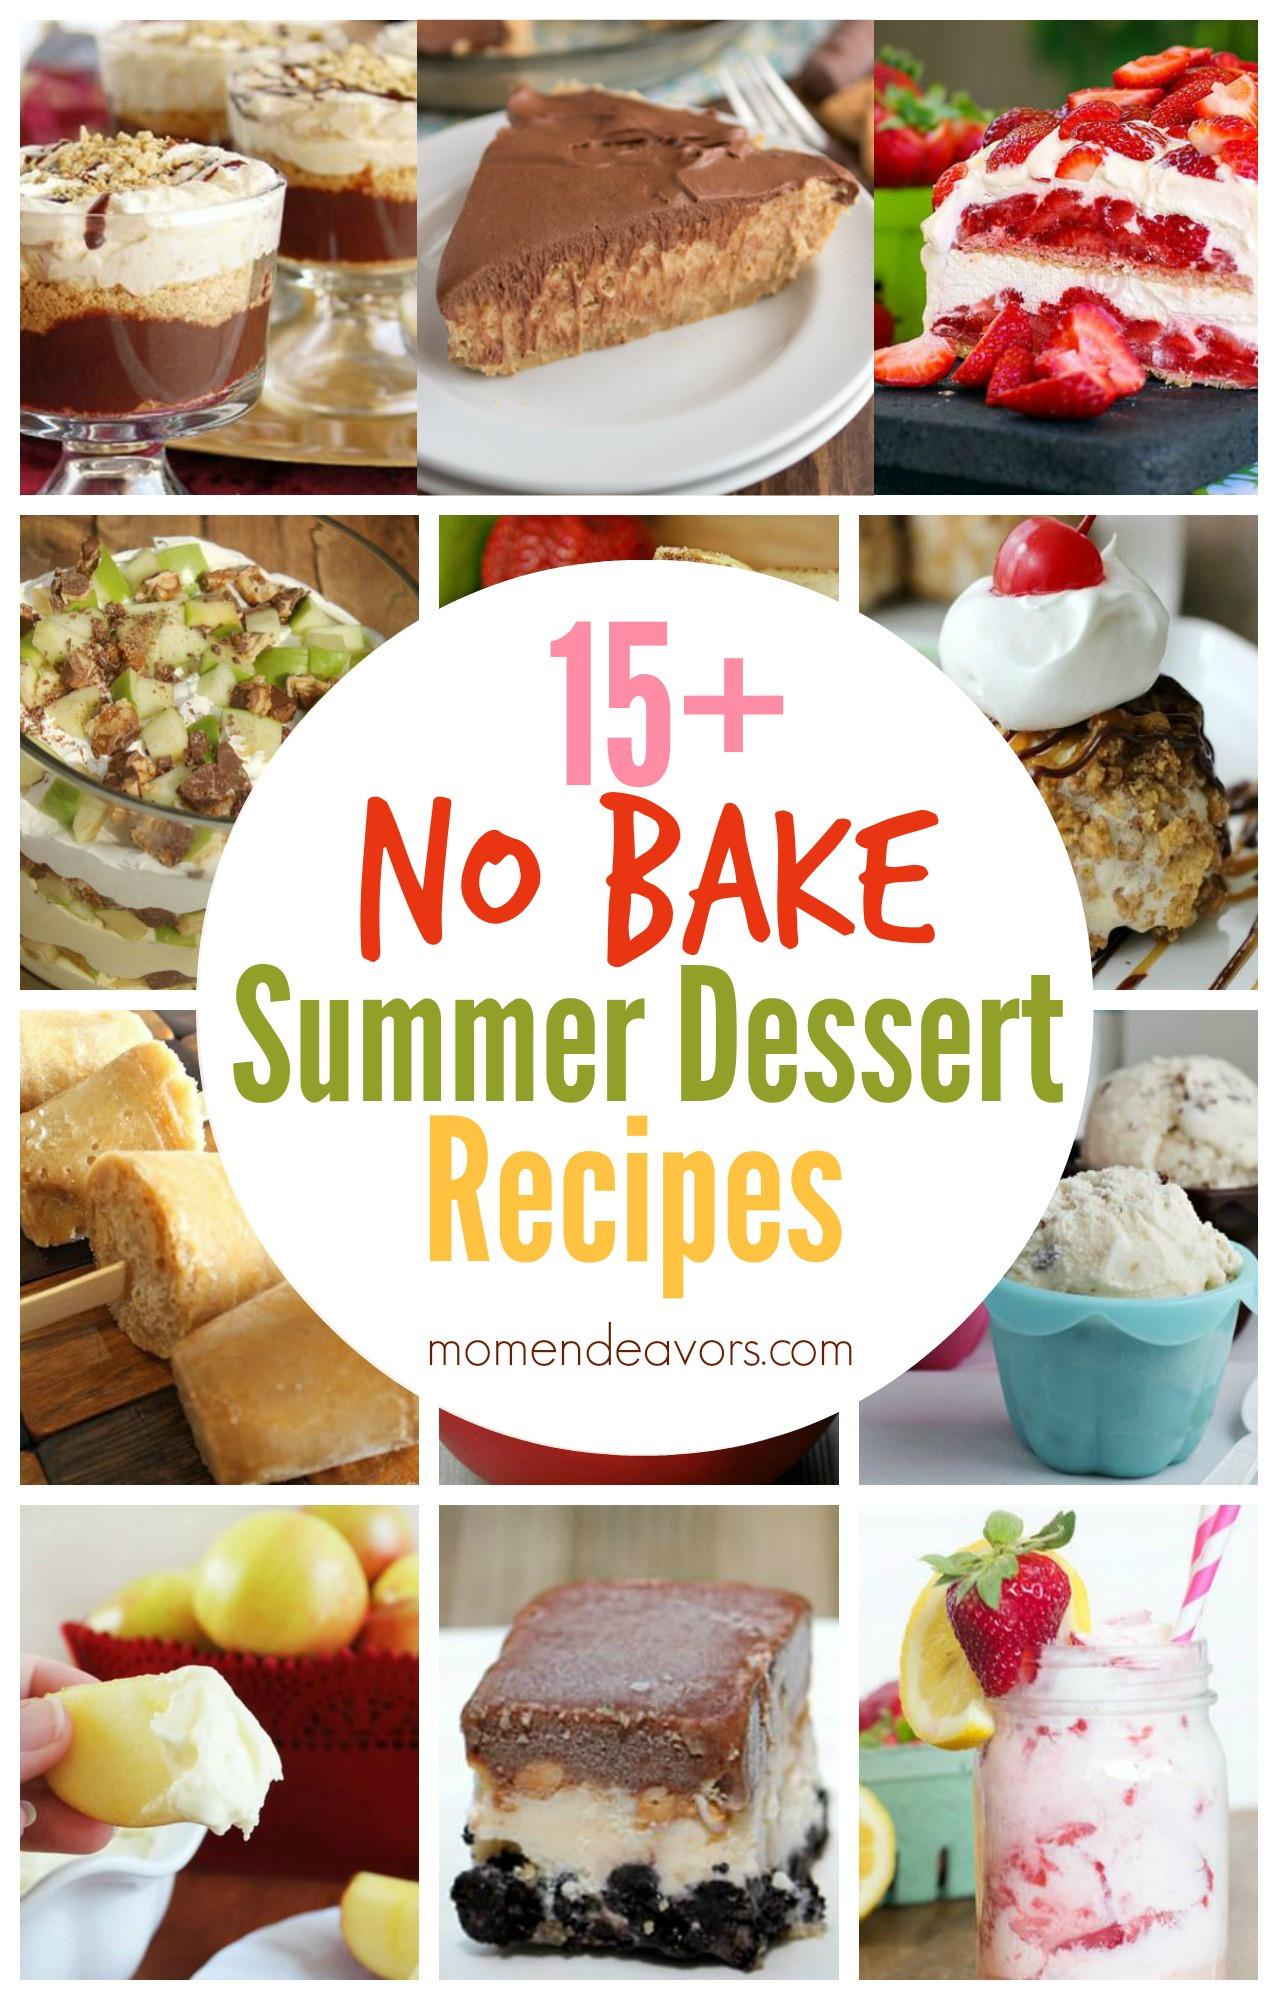 Summer Desserts No Bake the Best Ideas for 15 No Bake Summer Dessert Recipes